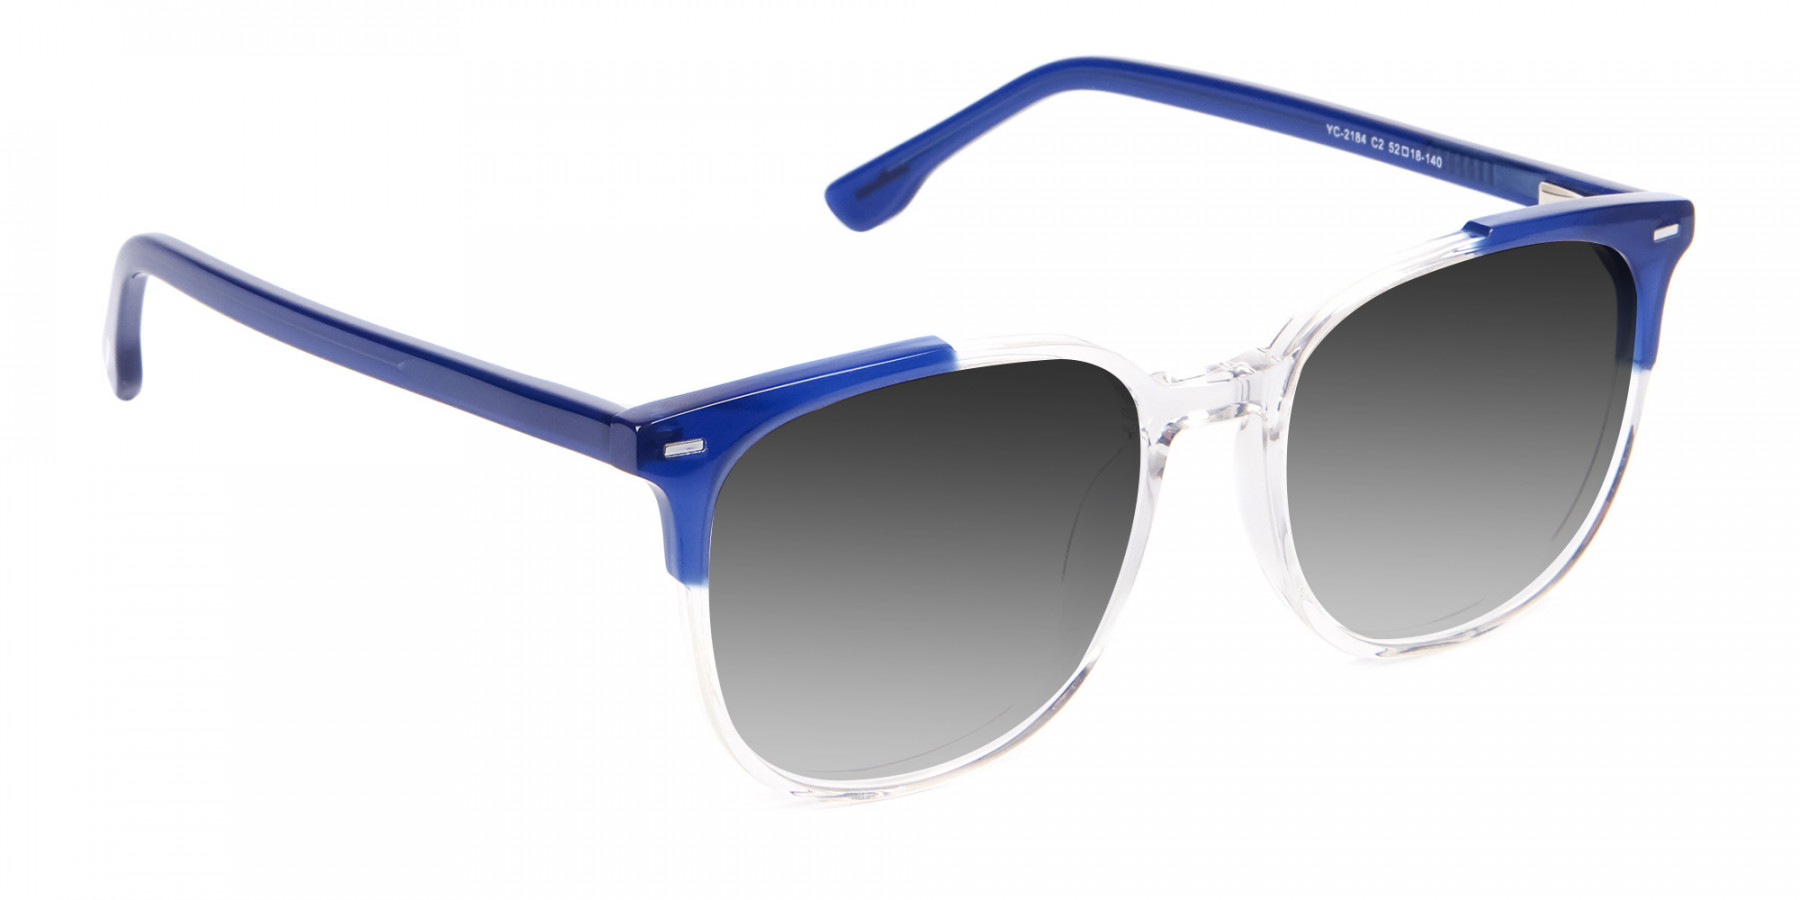 Wayfarer Grey Tint Sunglasses Online-3